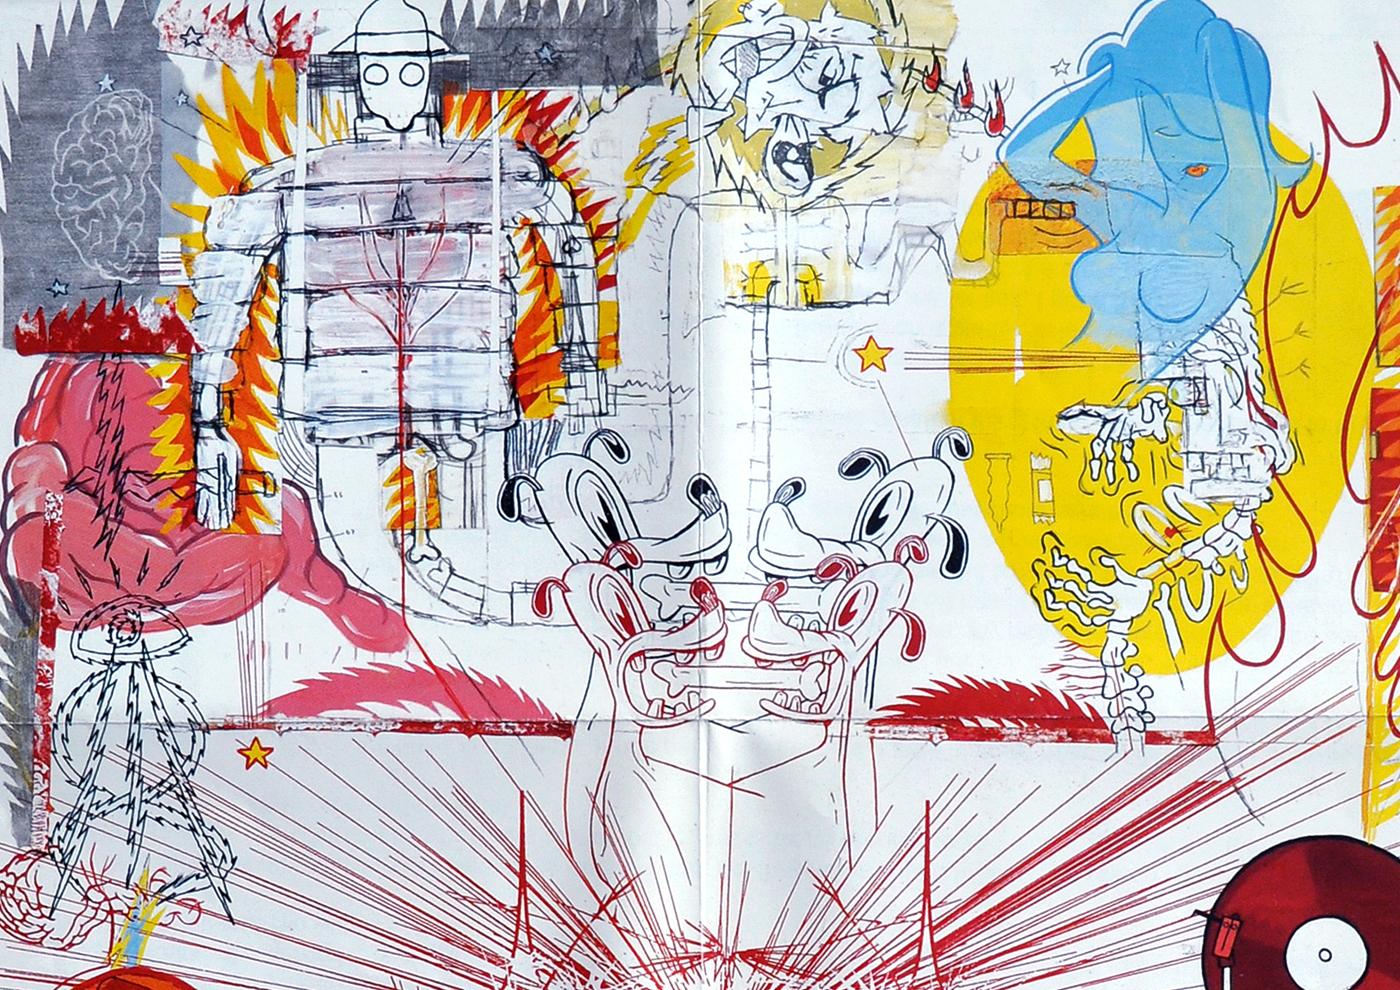 Prince Paul — Psychoanalysis. Detail of Poster Art